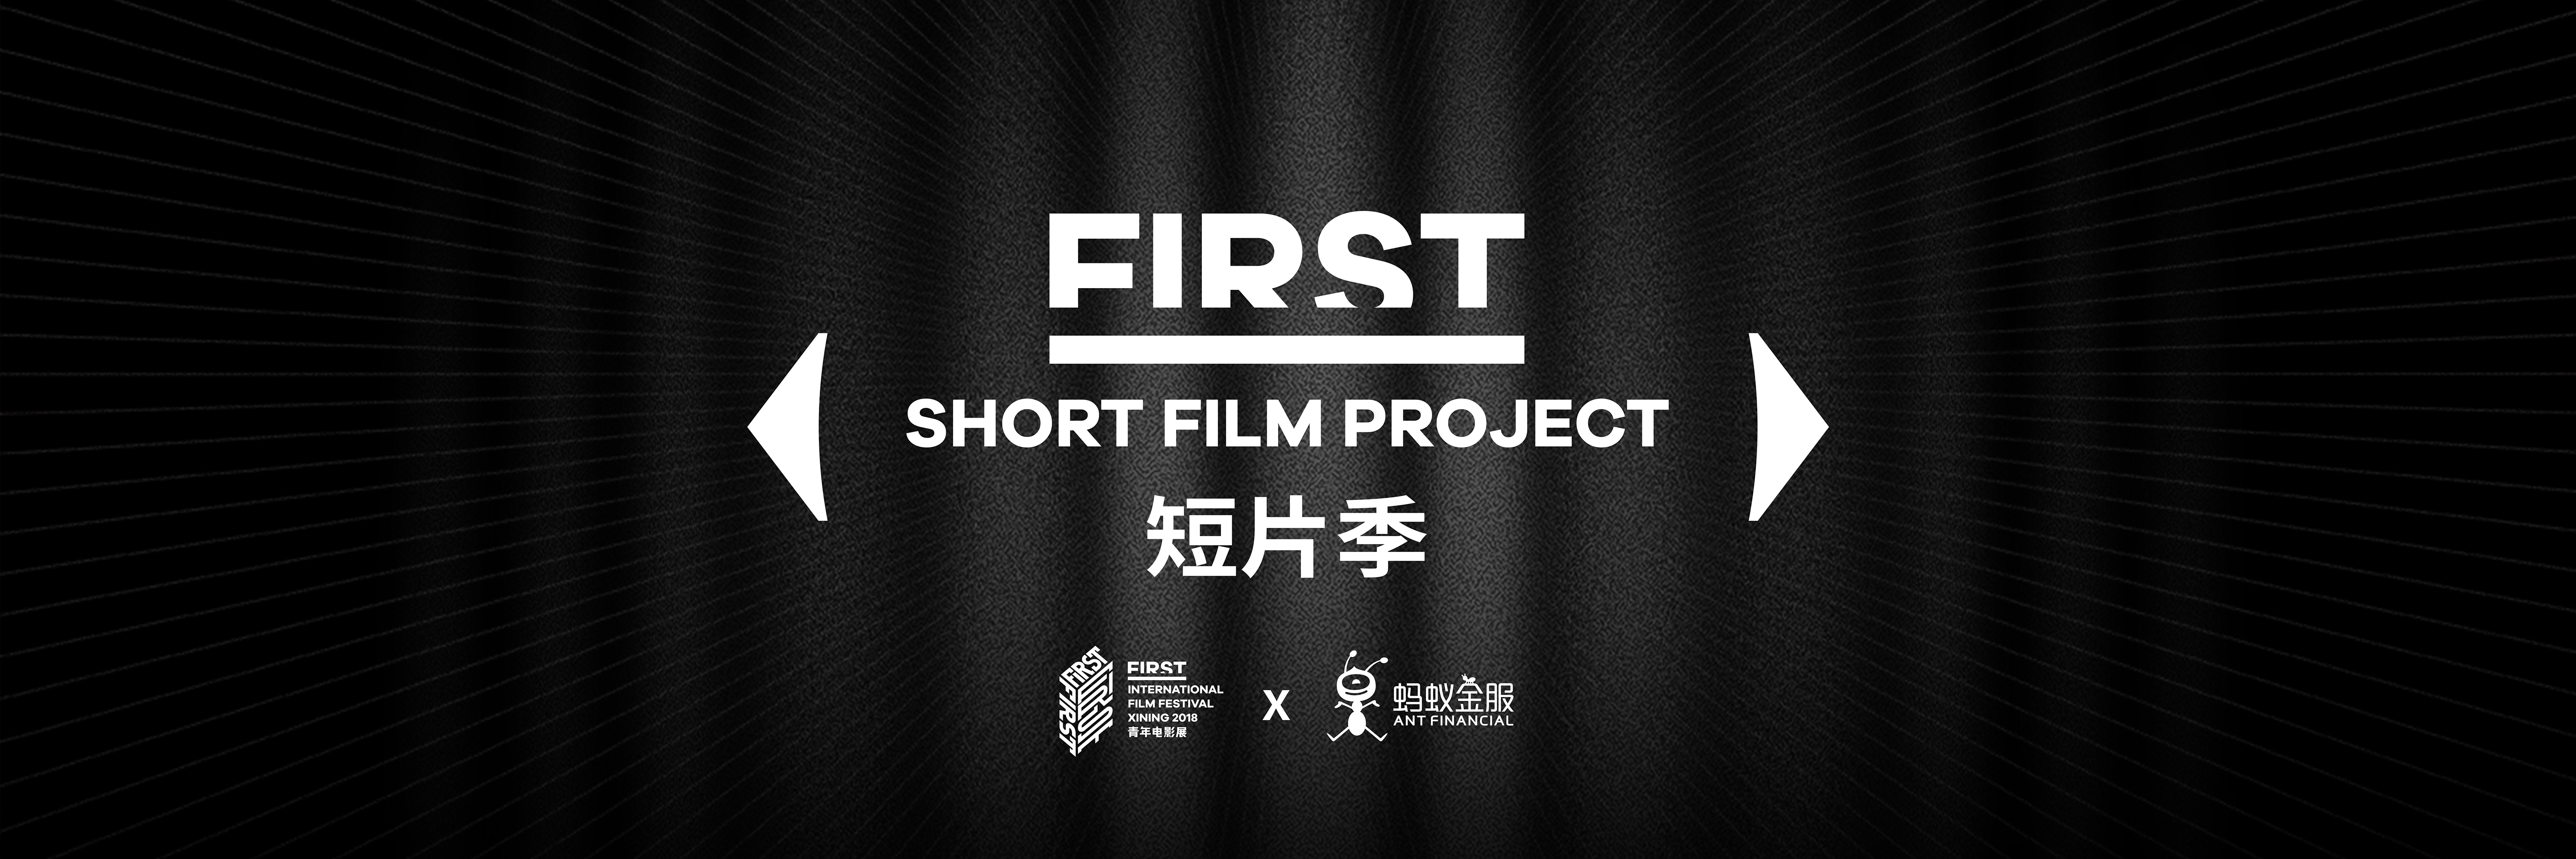 cn.org.firstfilm.domain.support.MultiLanguageValue@4b41cd30